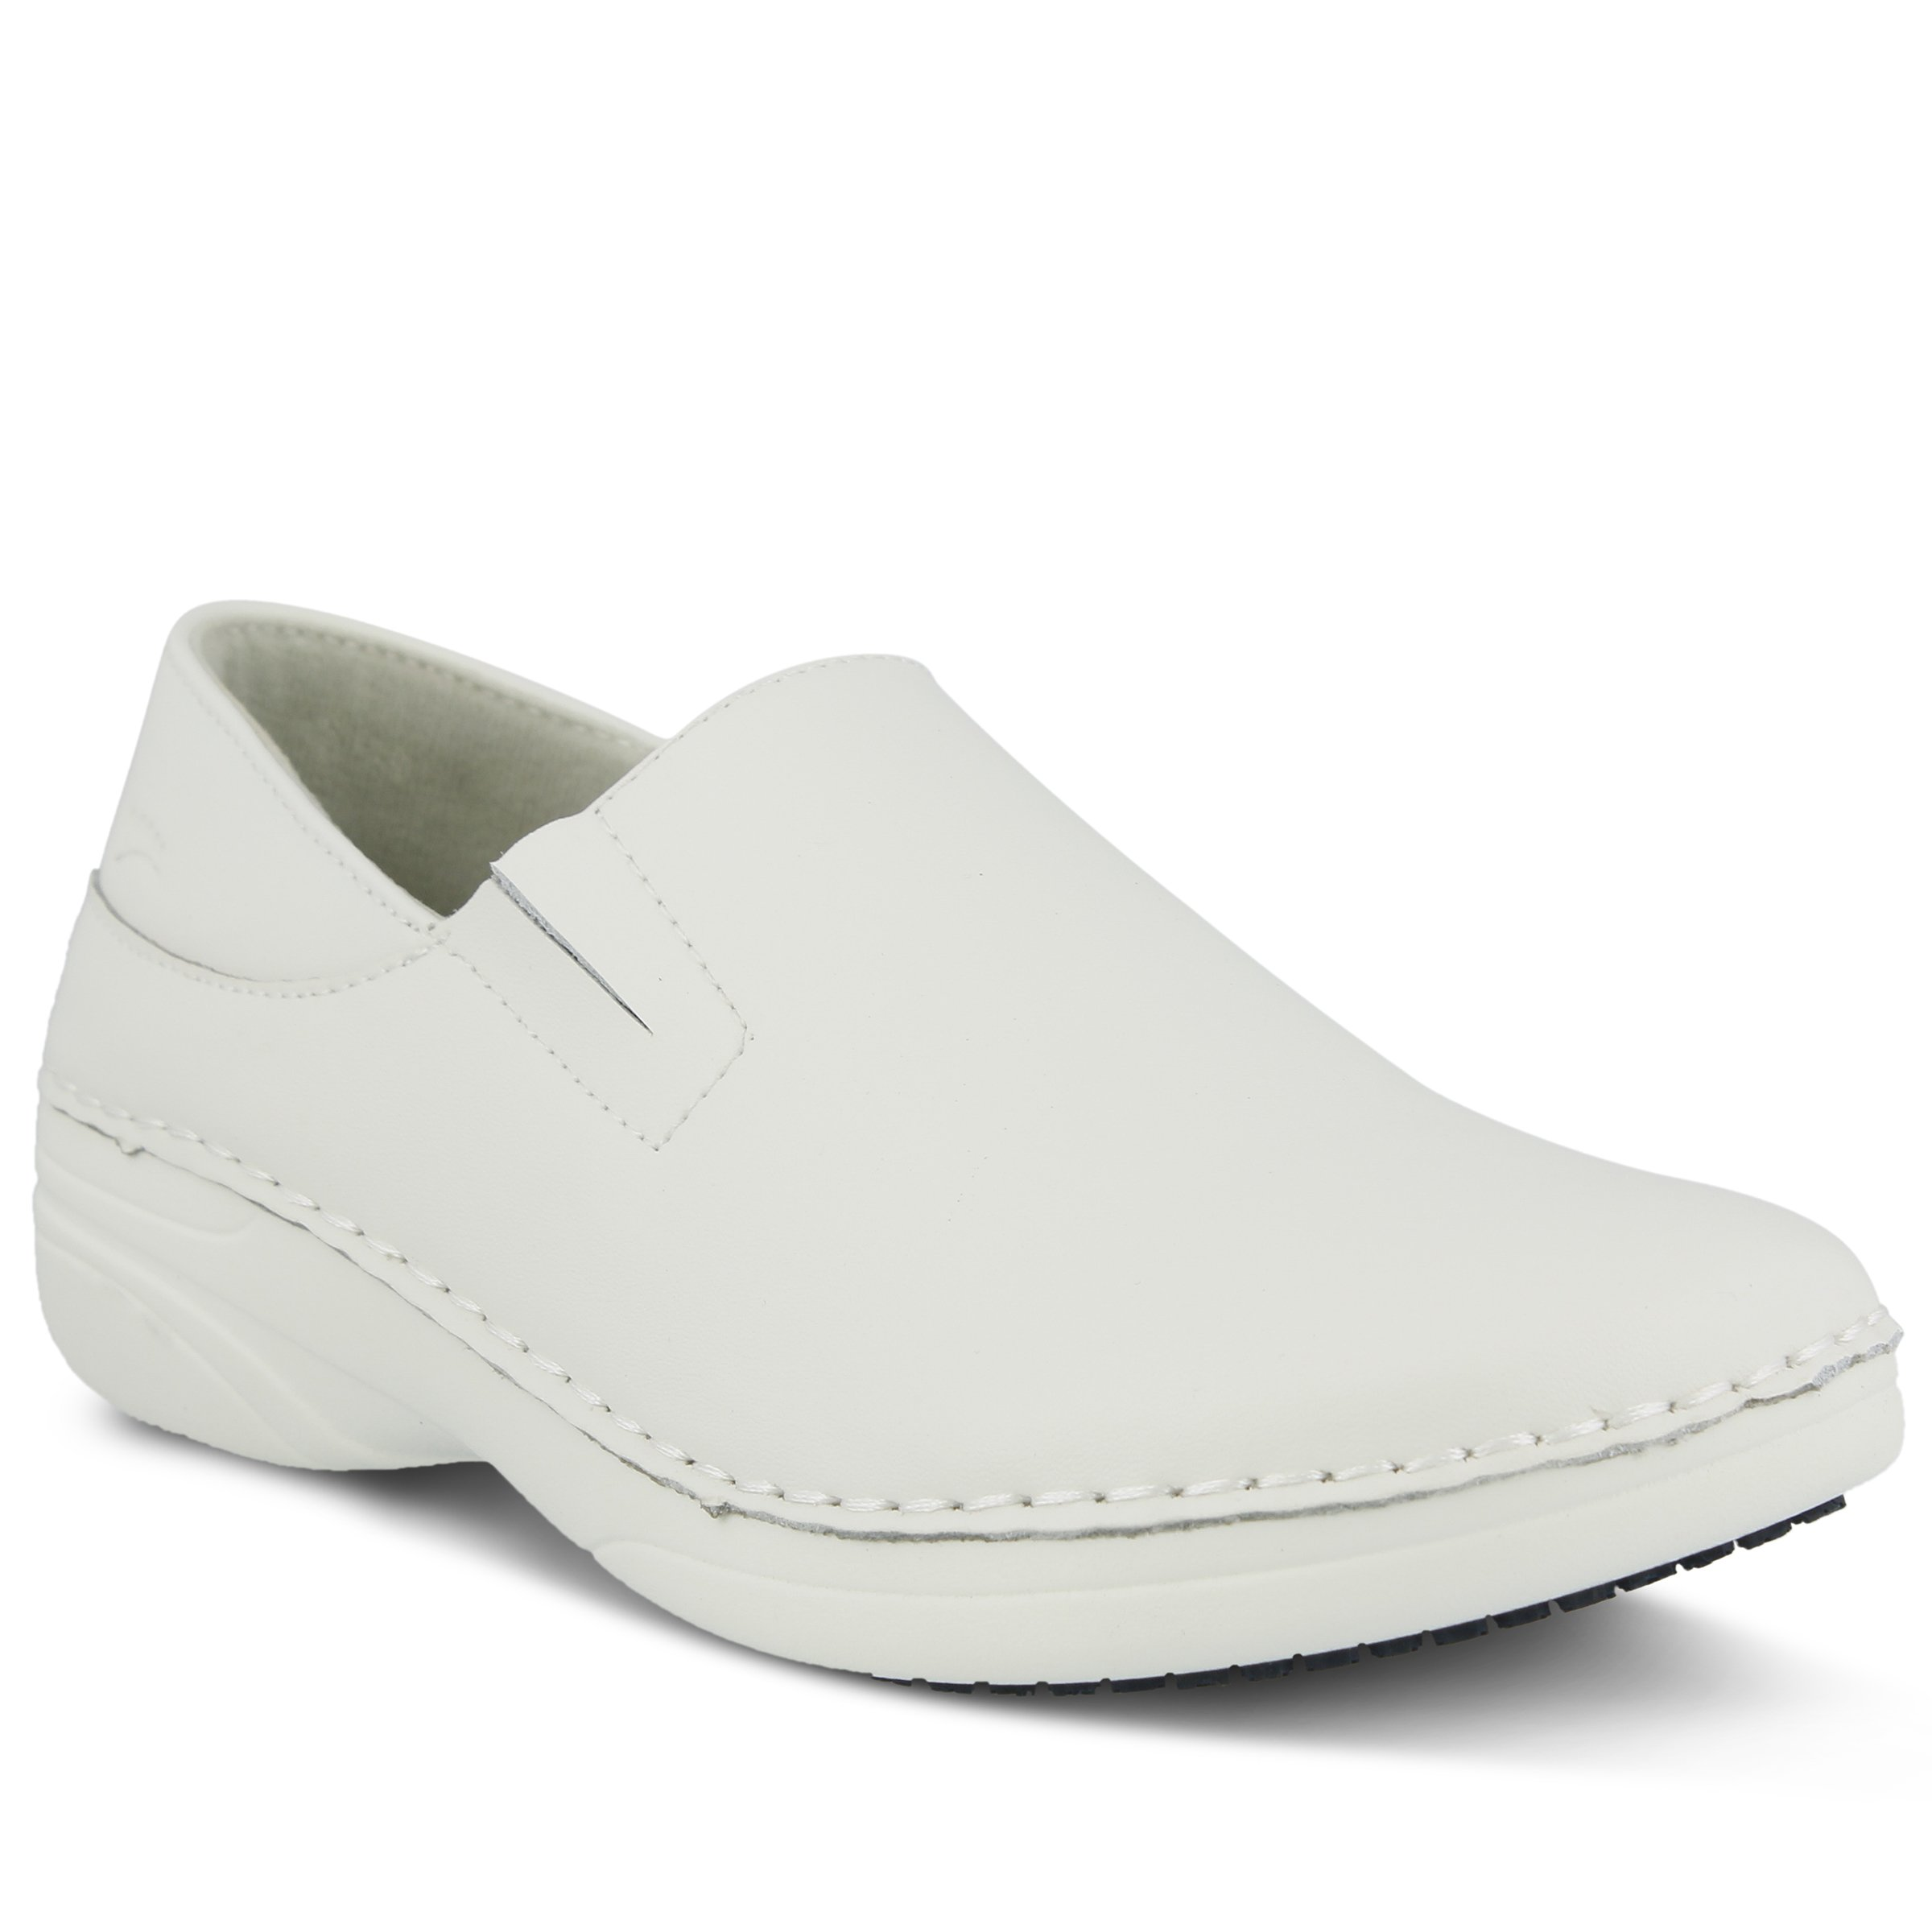 Spring Step Women's Manila Work Shoe, White, 9.5 W US